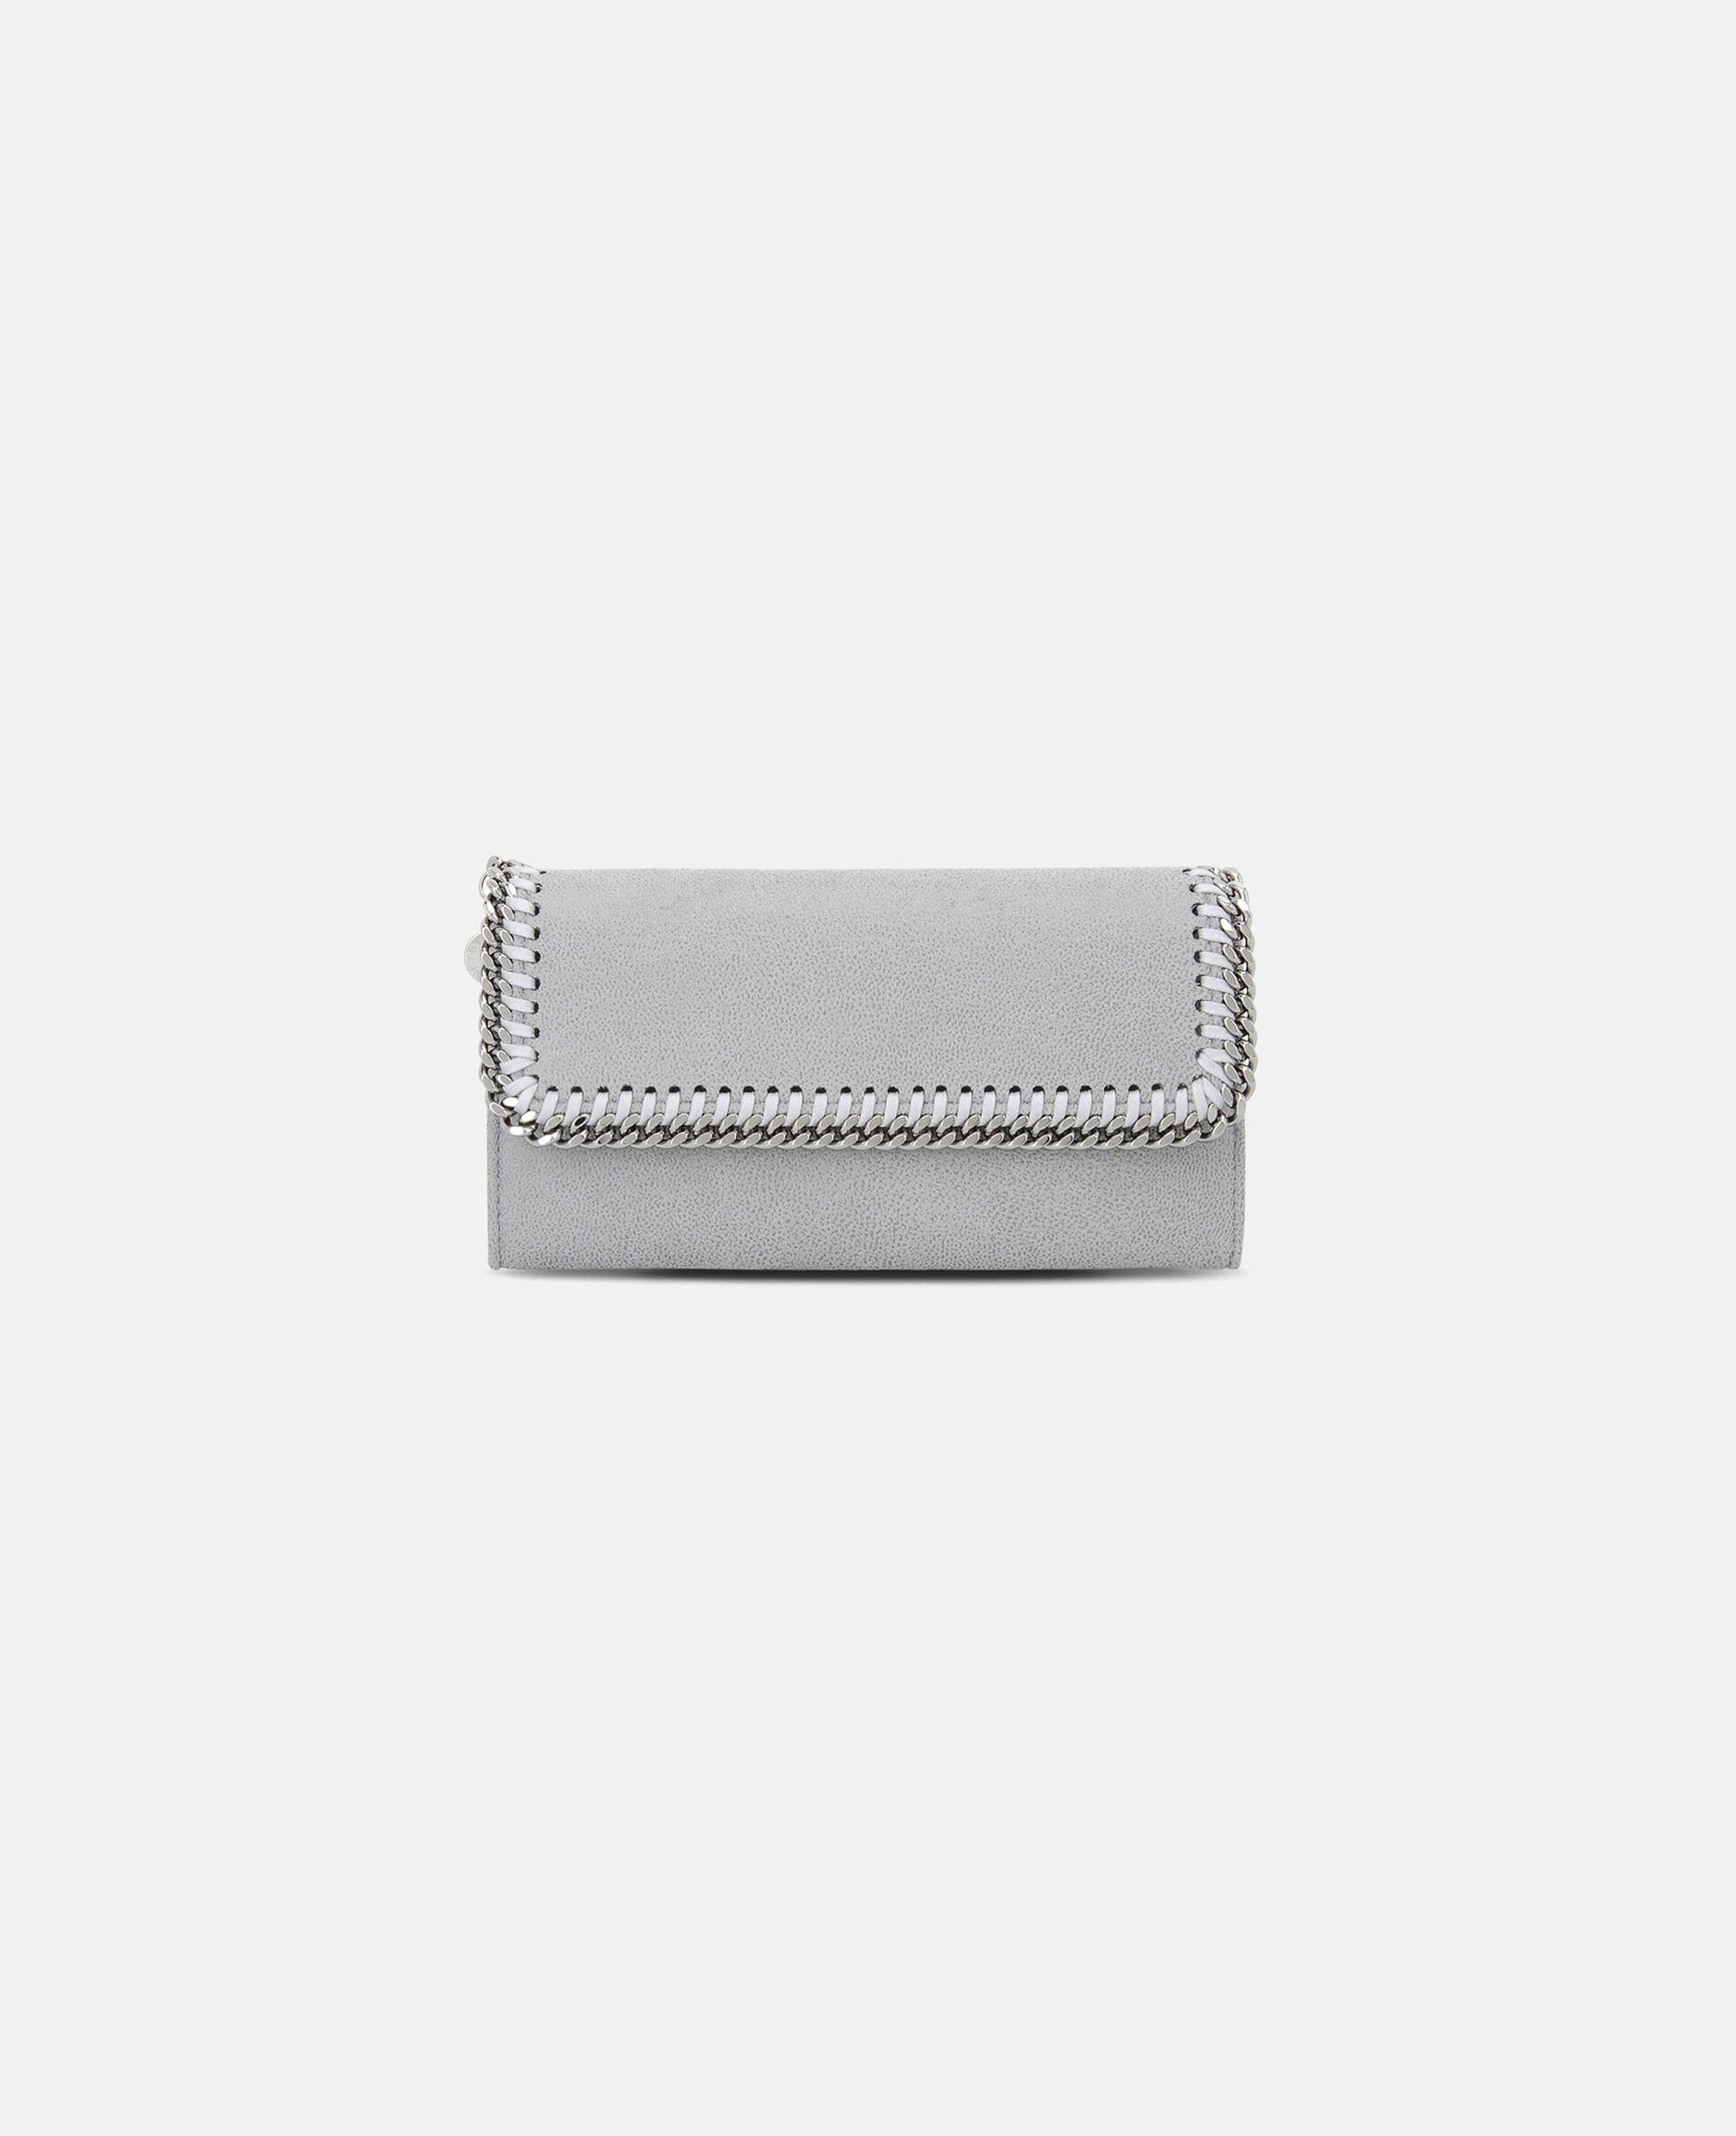 Kontinentale Brieftasche Falabella-Grau-large image number 0